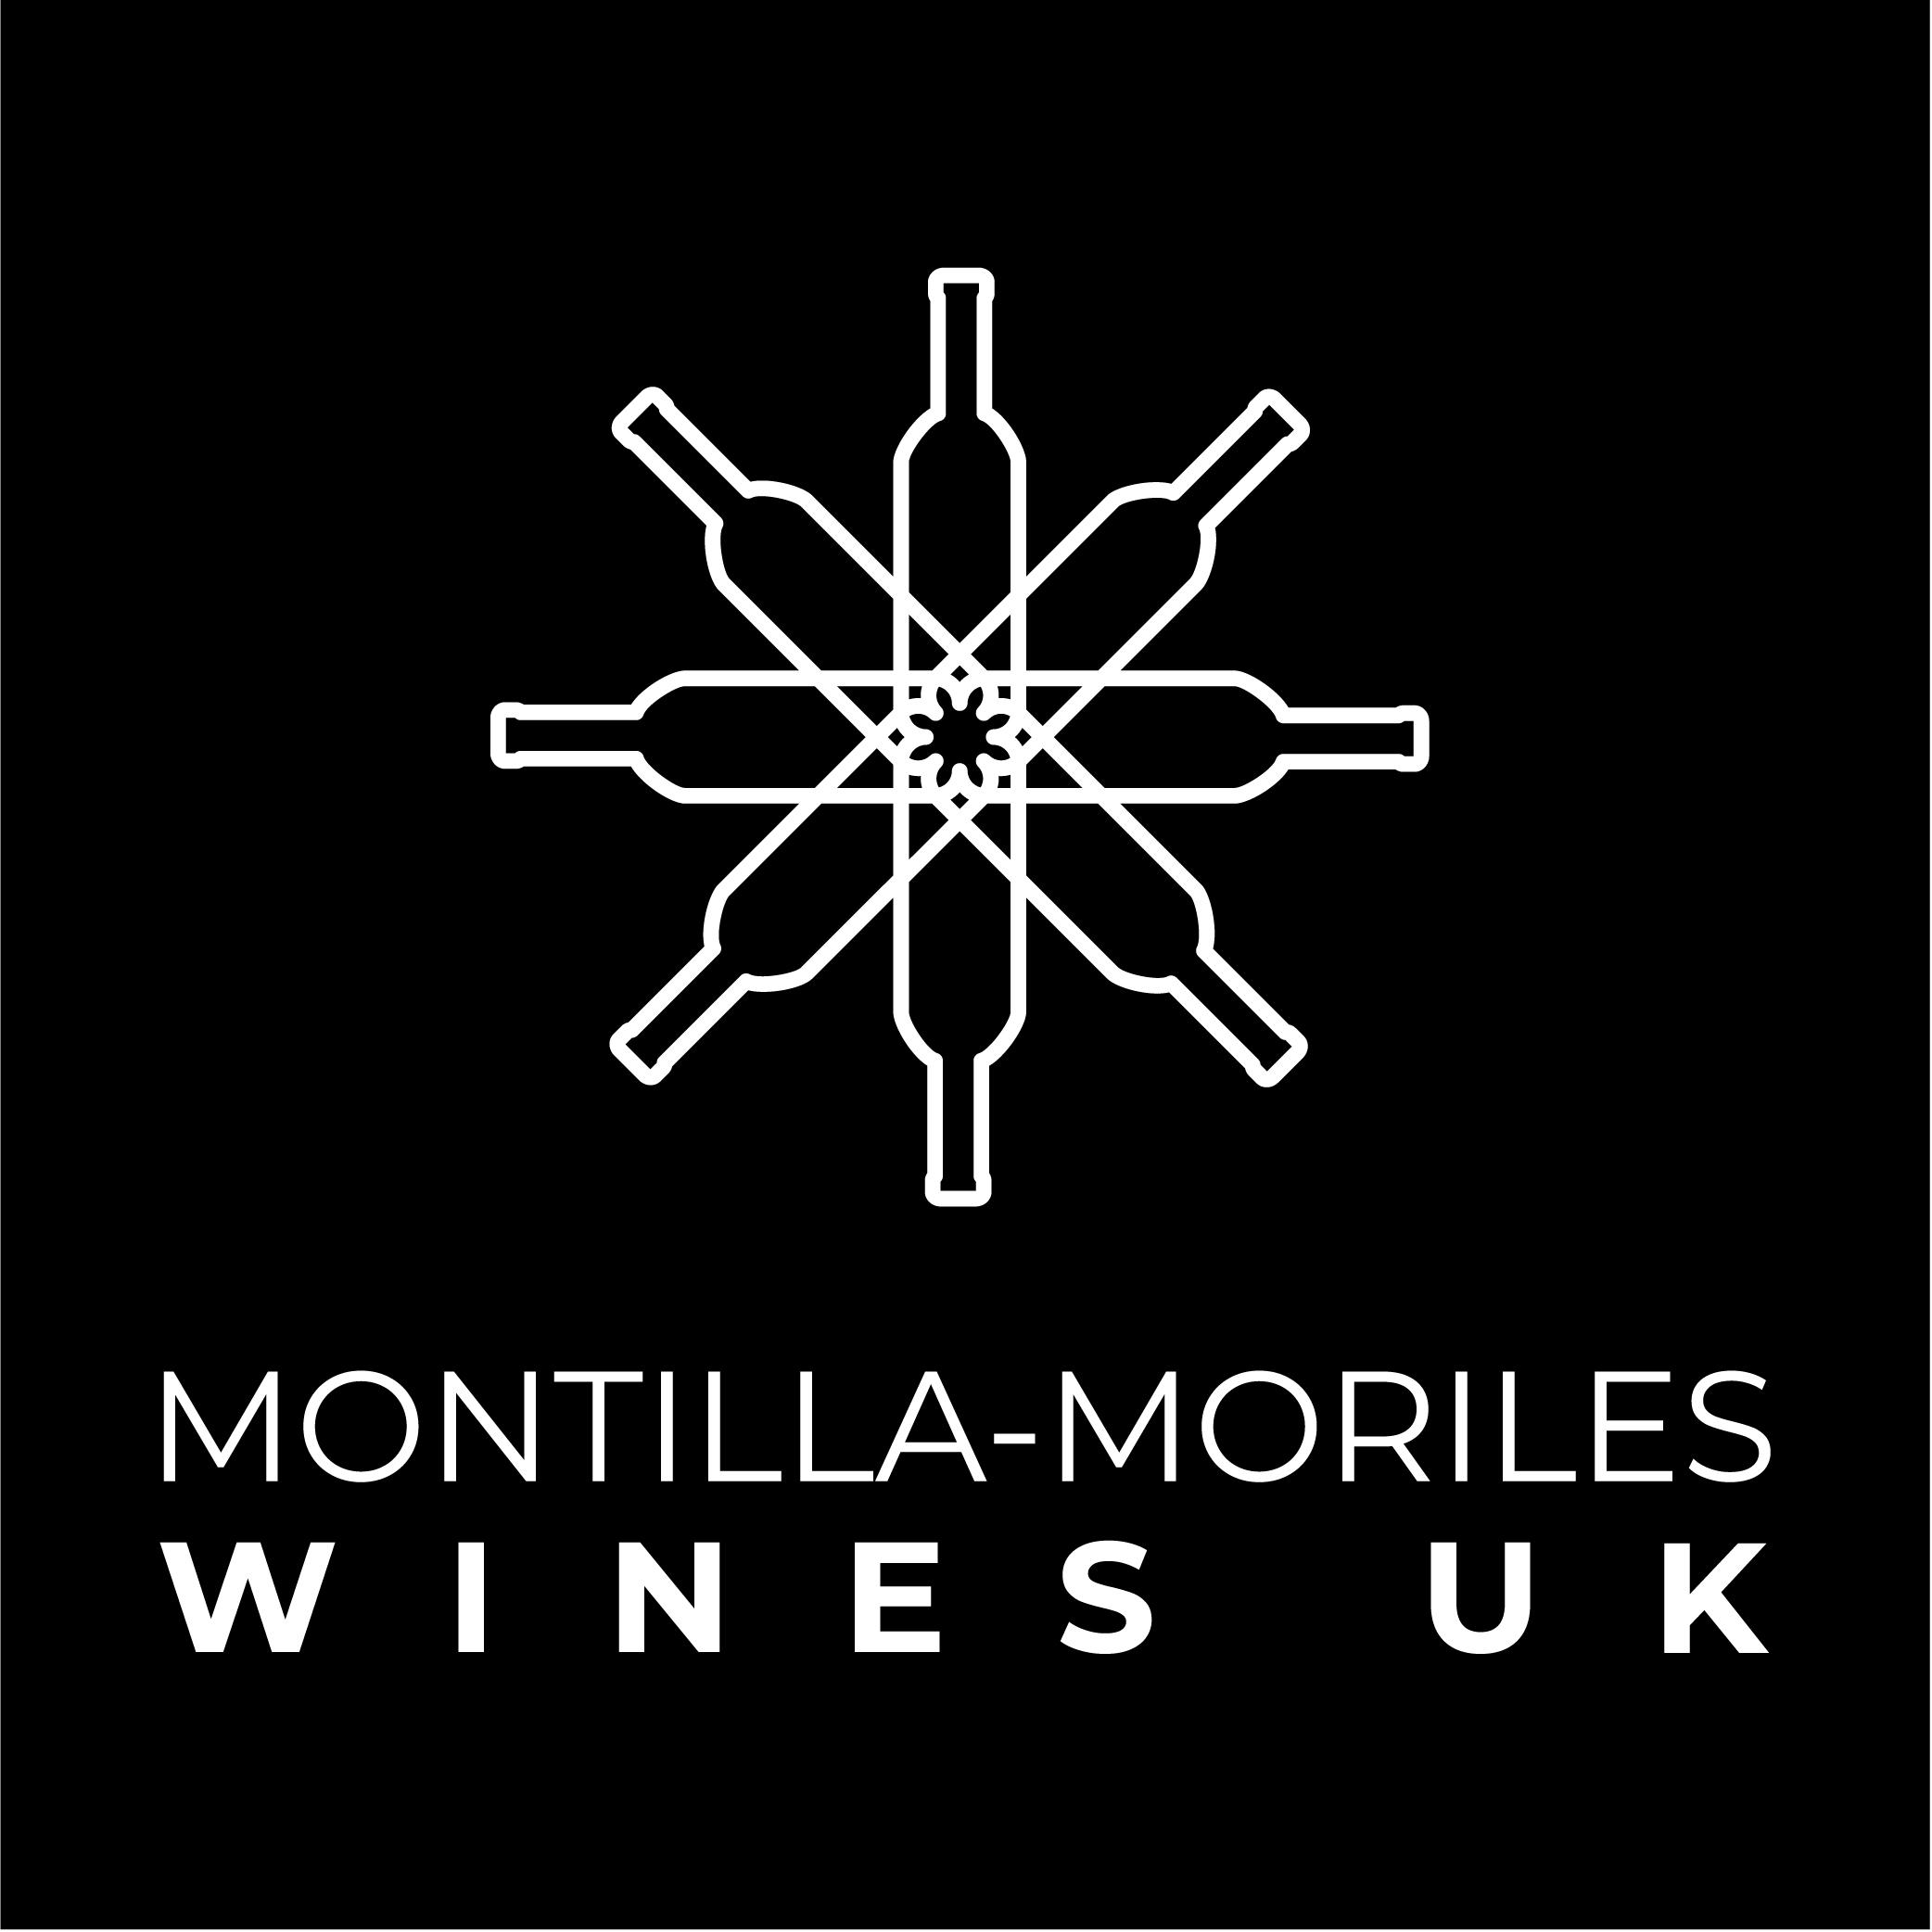 Montilla-Moriles Wines UK